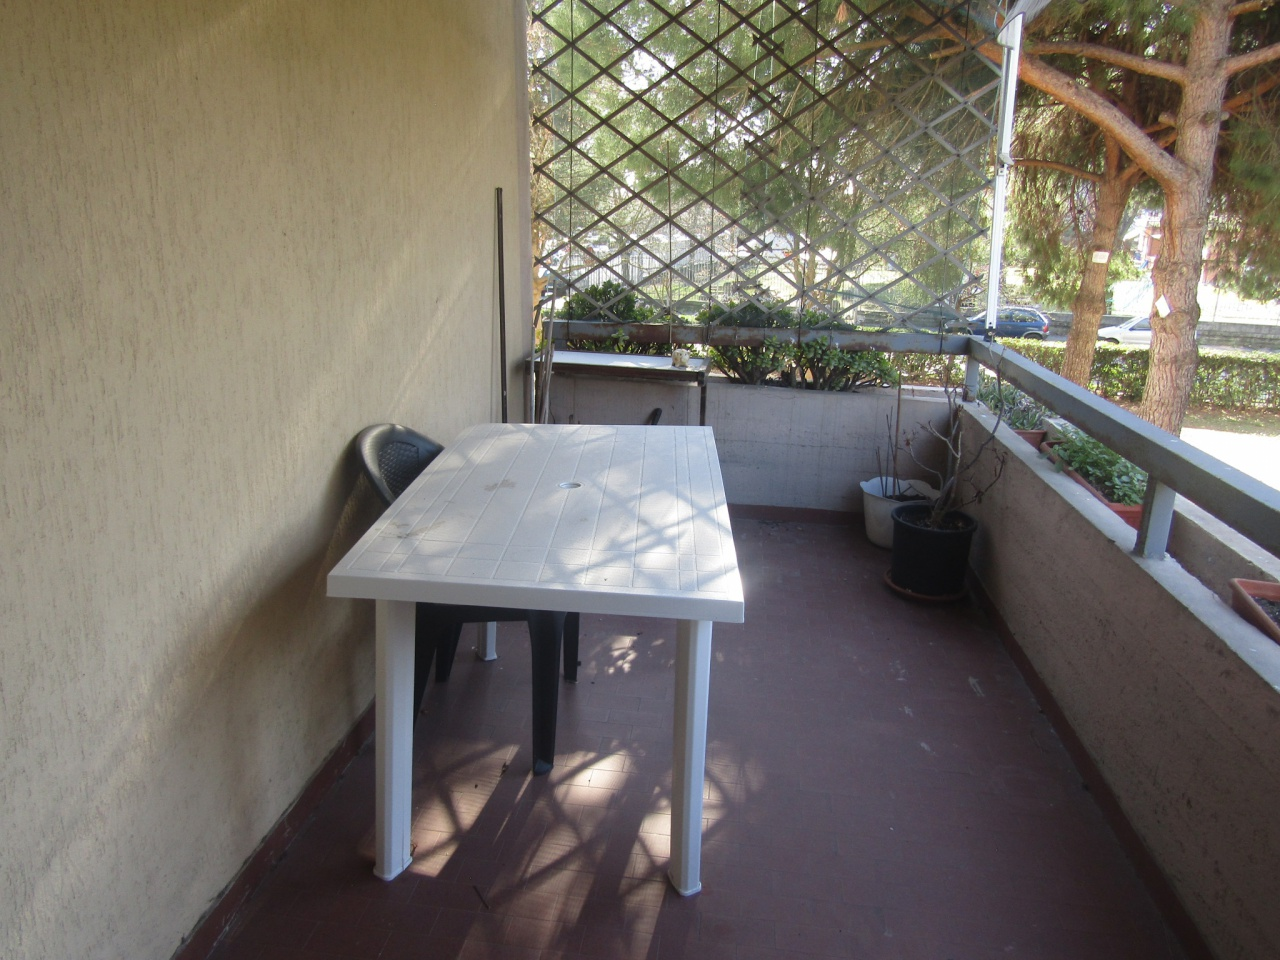 viareggio vendita quart:  studio immobiliare errepi